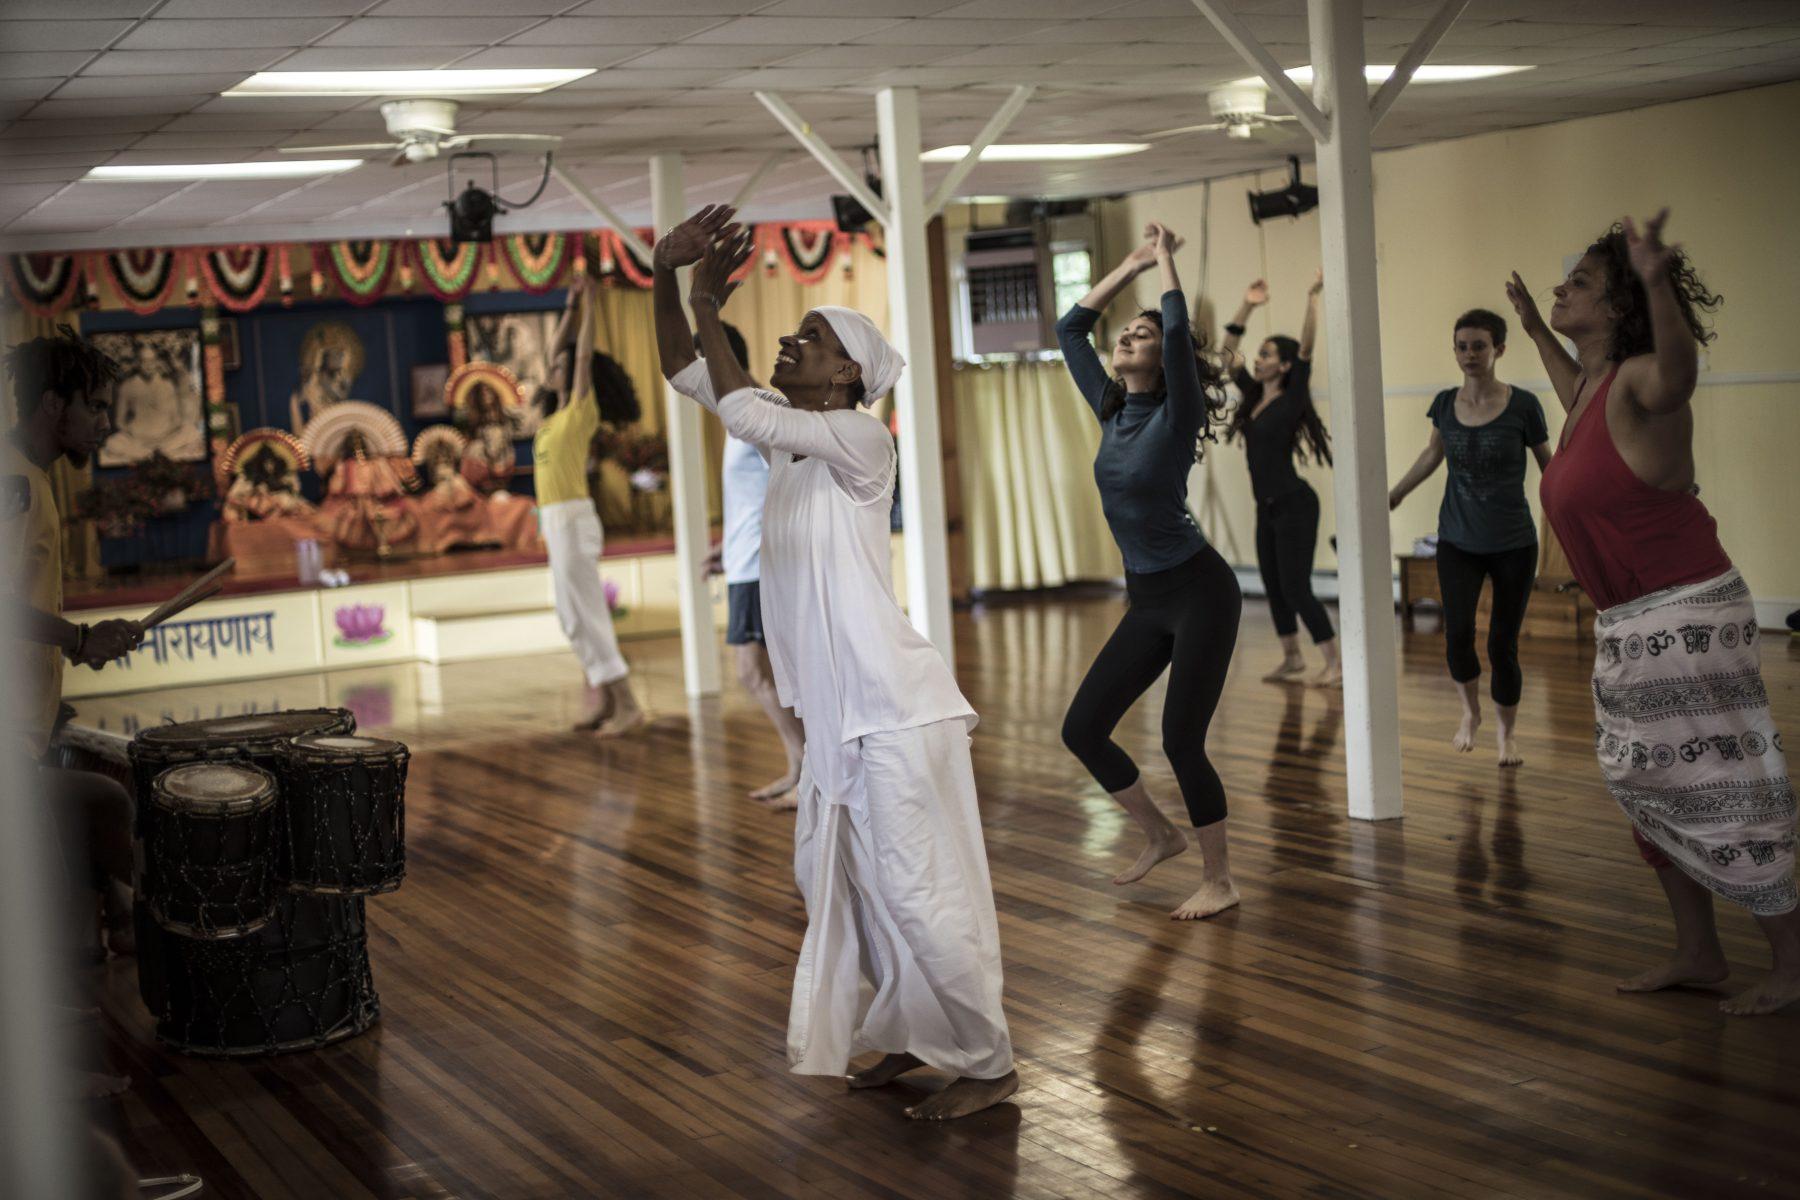 Movement & Meditation at the Sivananda Yoga Ranch